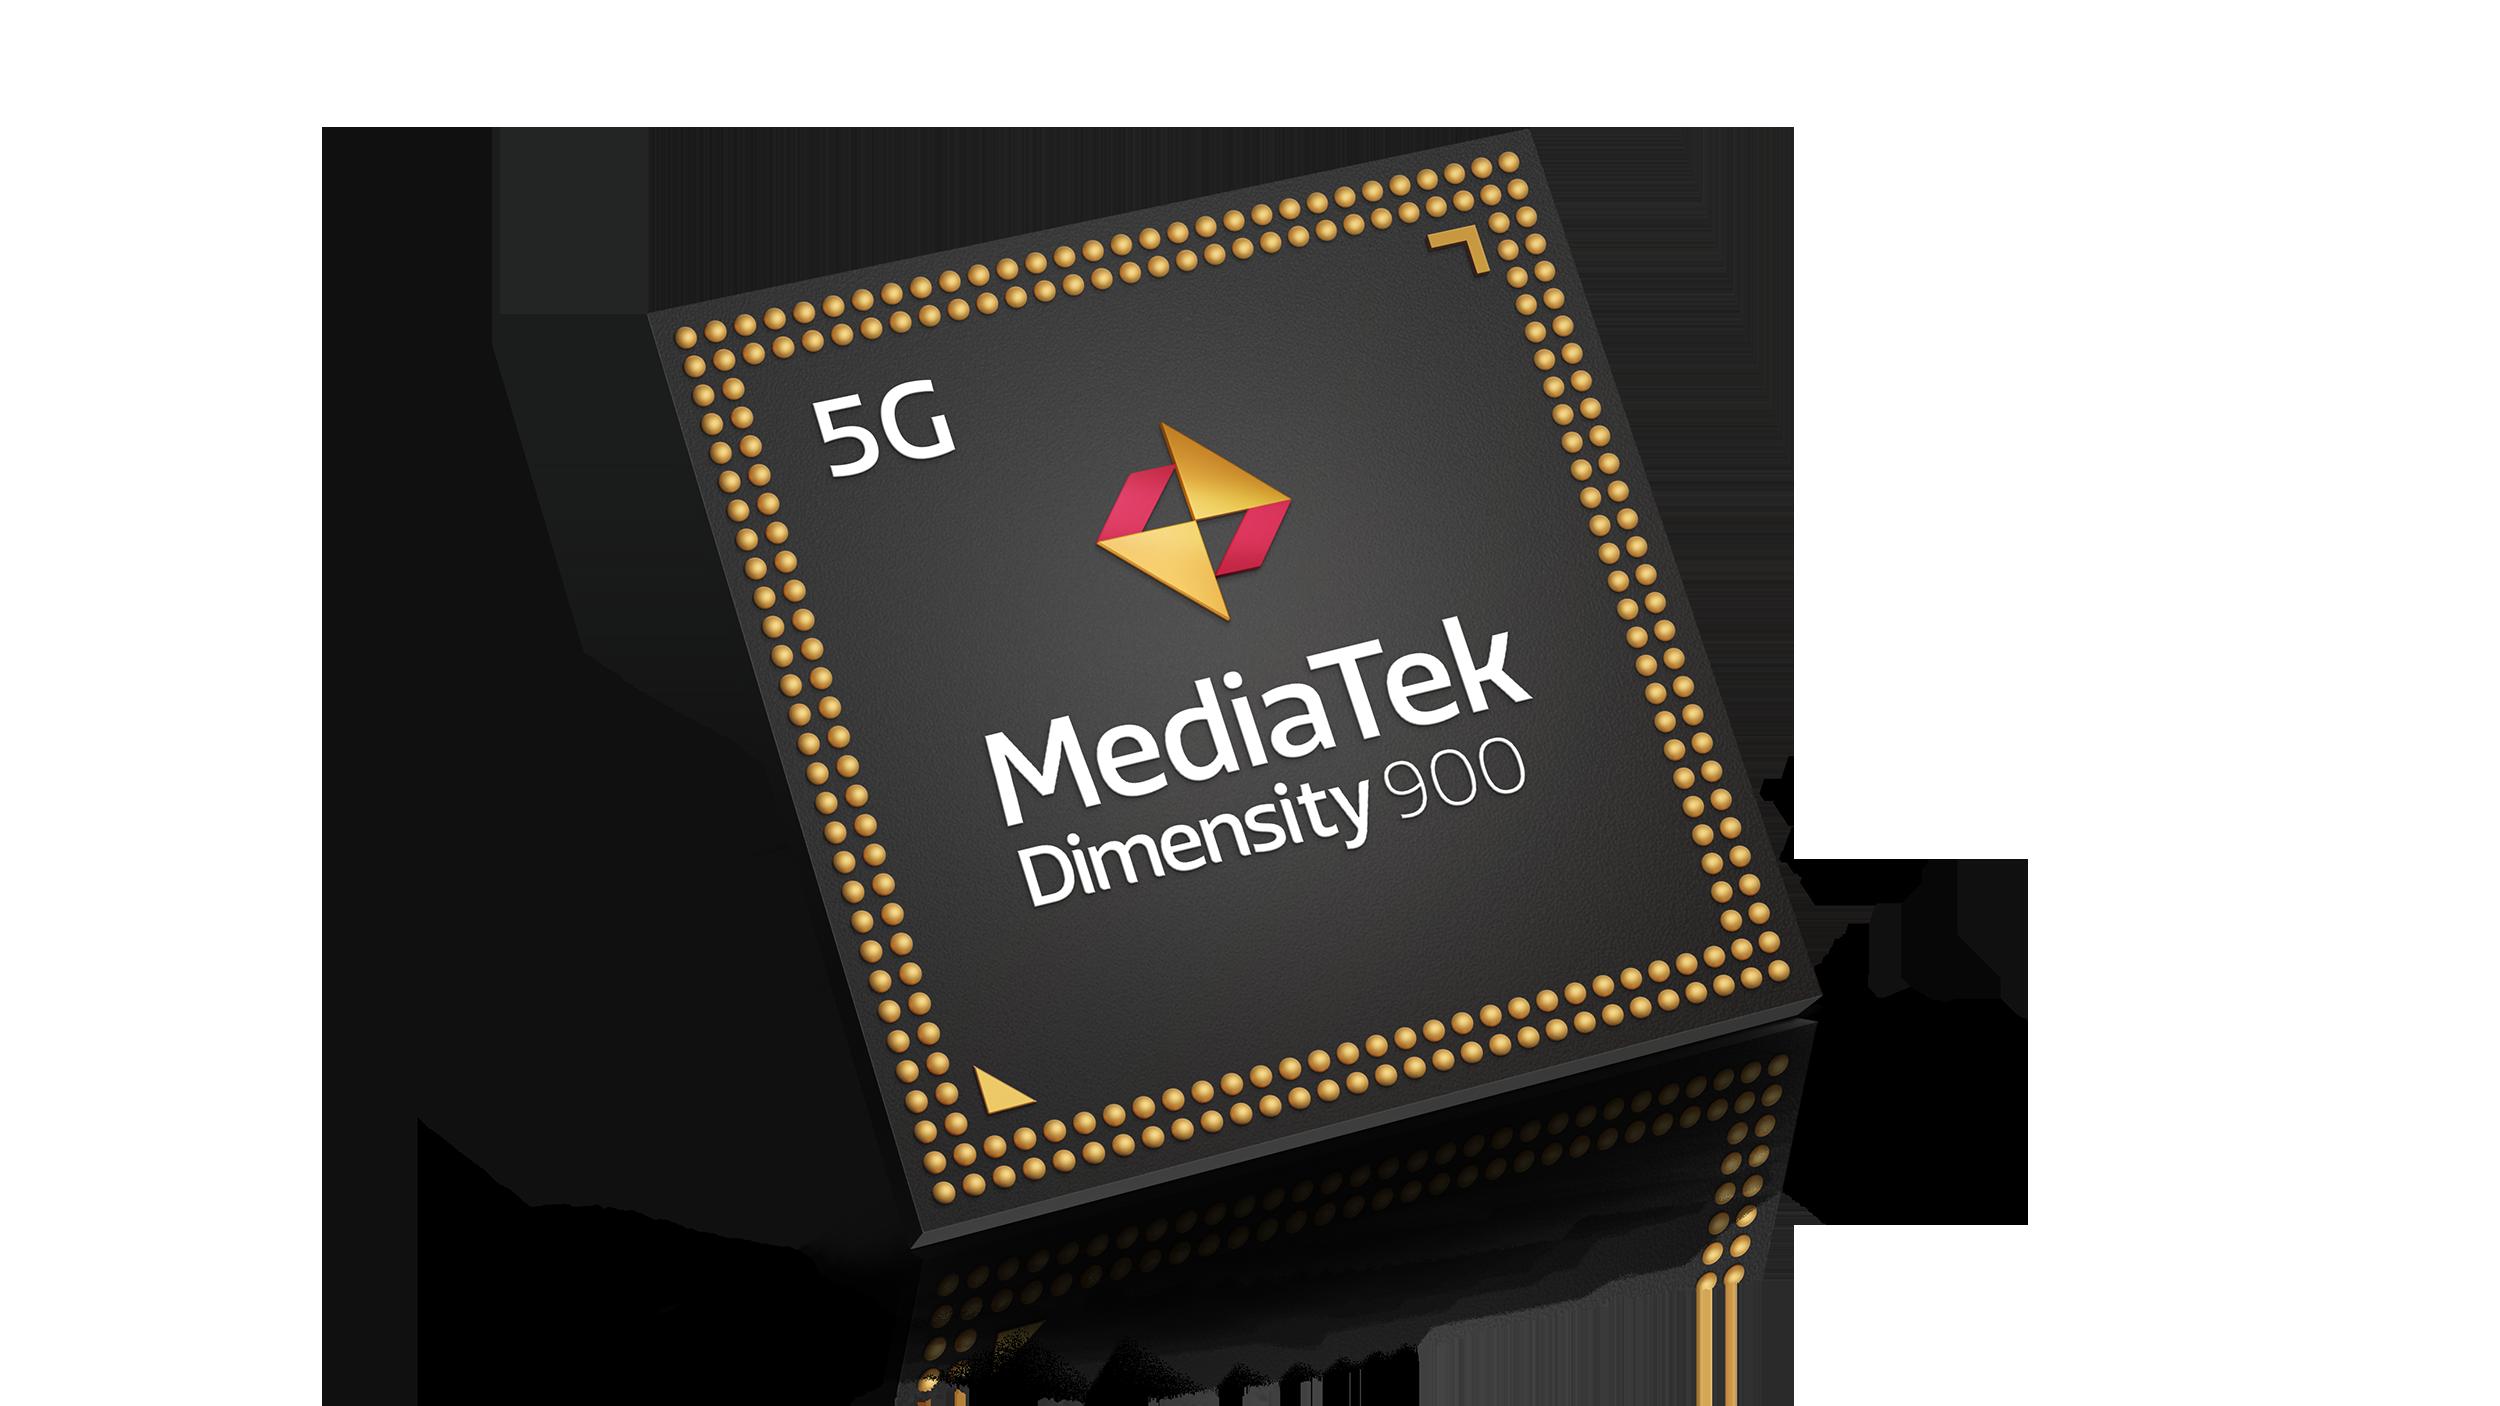 Nuevo chipset Dimensity 900 5G de Mediatek